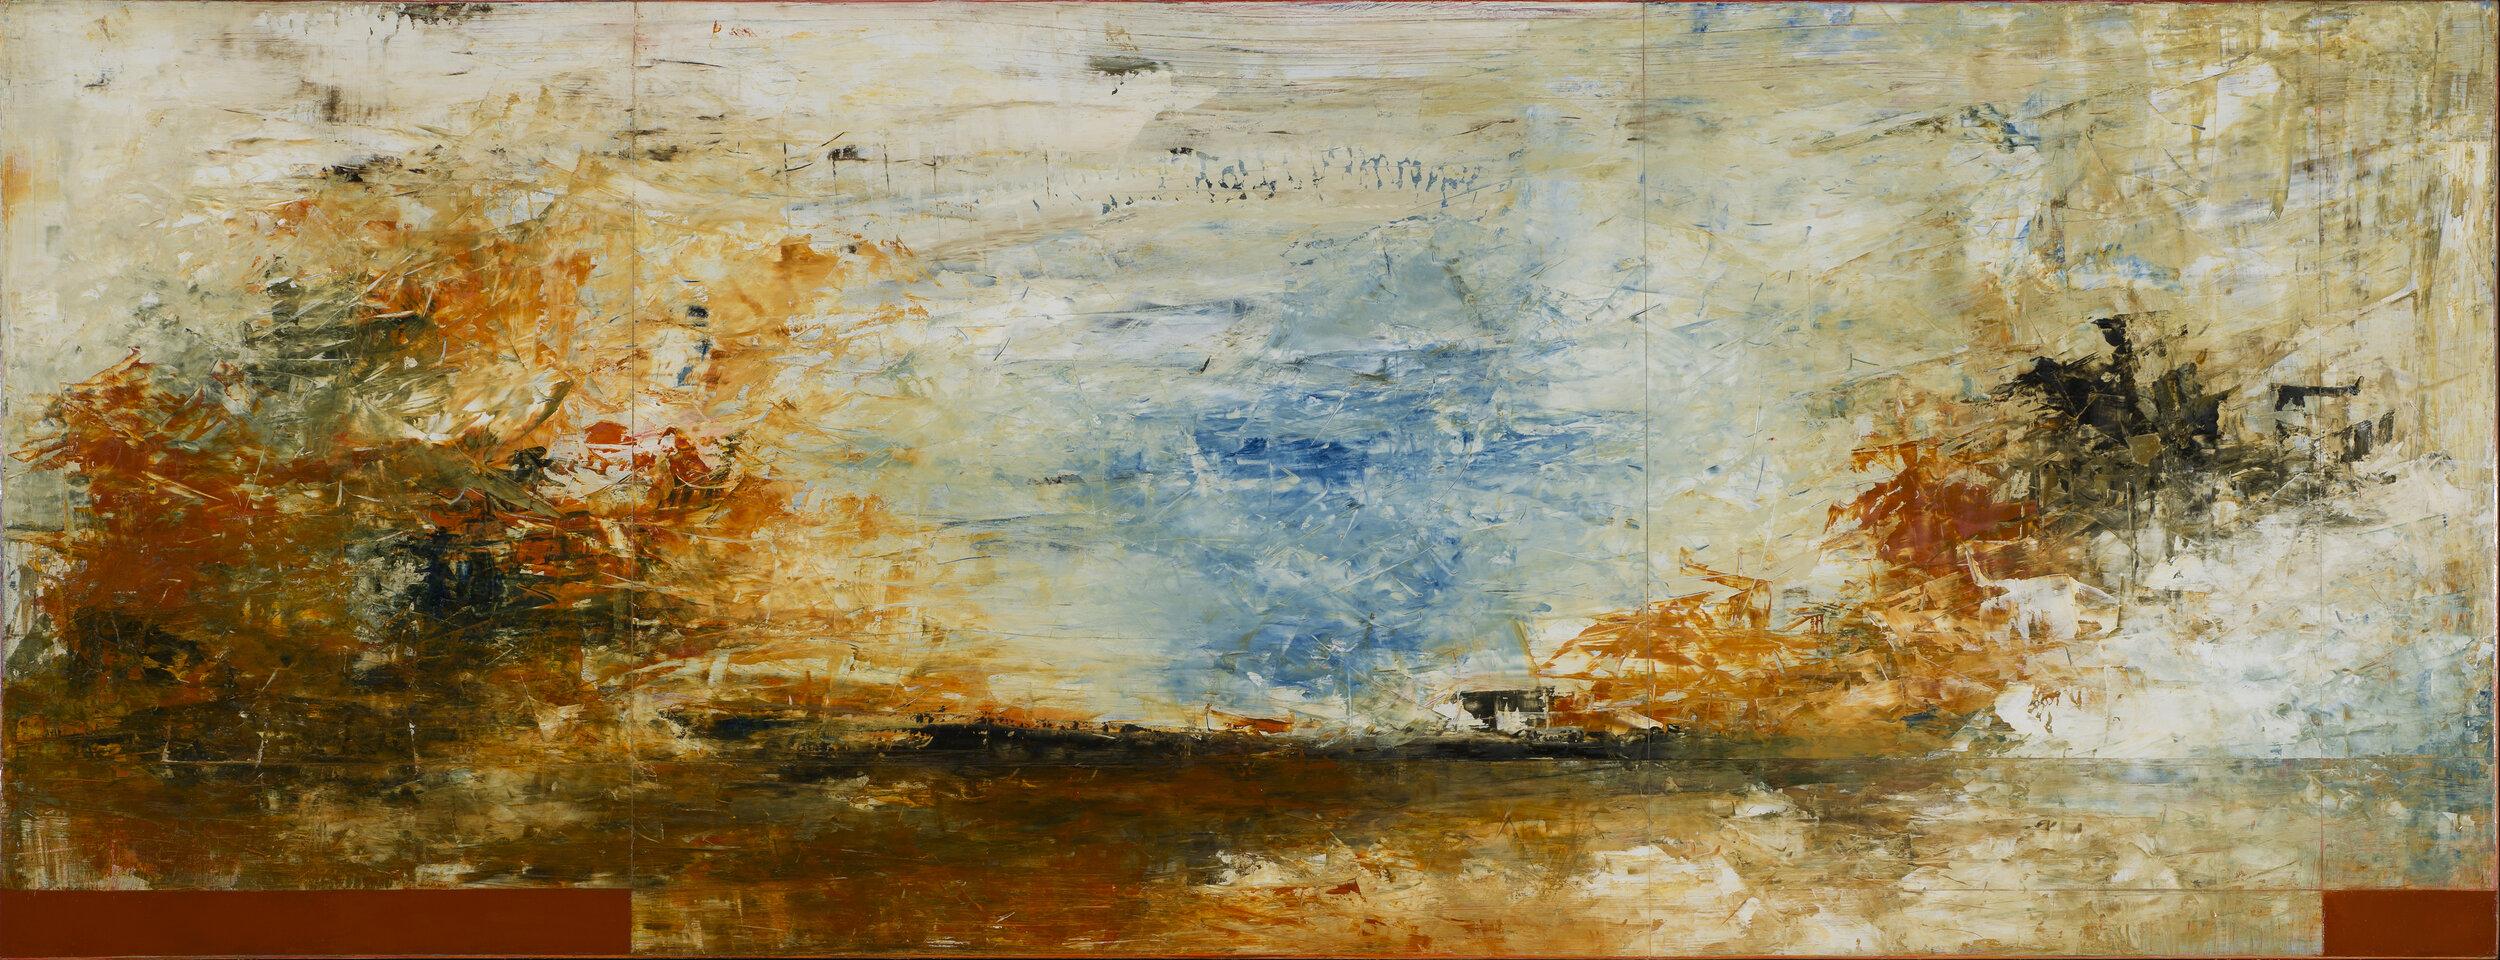 Anse Marechal, No 8 - Oil on Panel, 28 x 72.jpg